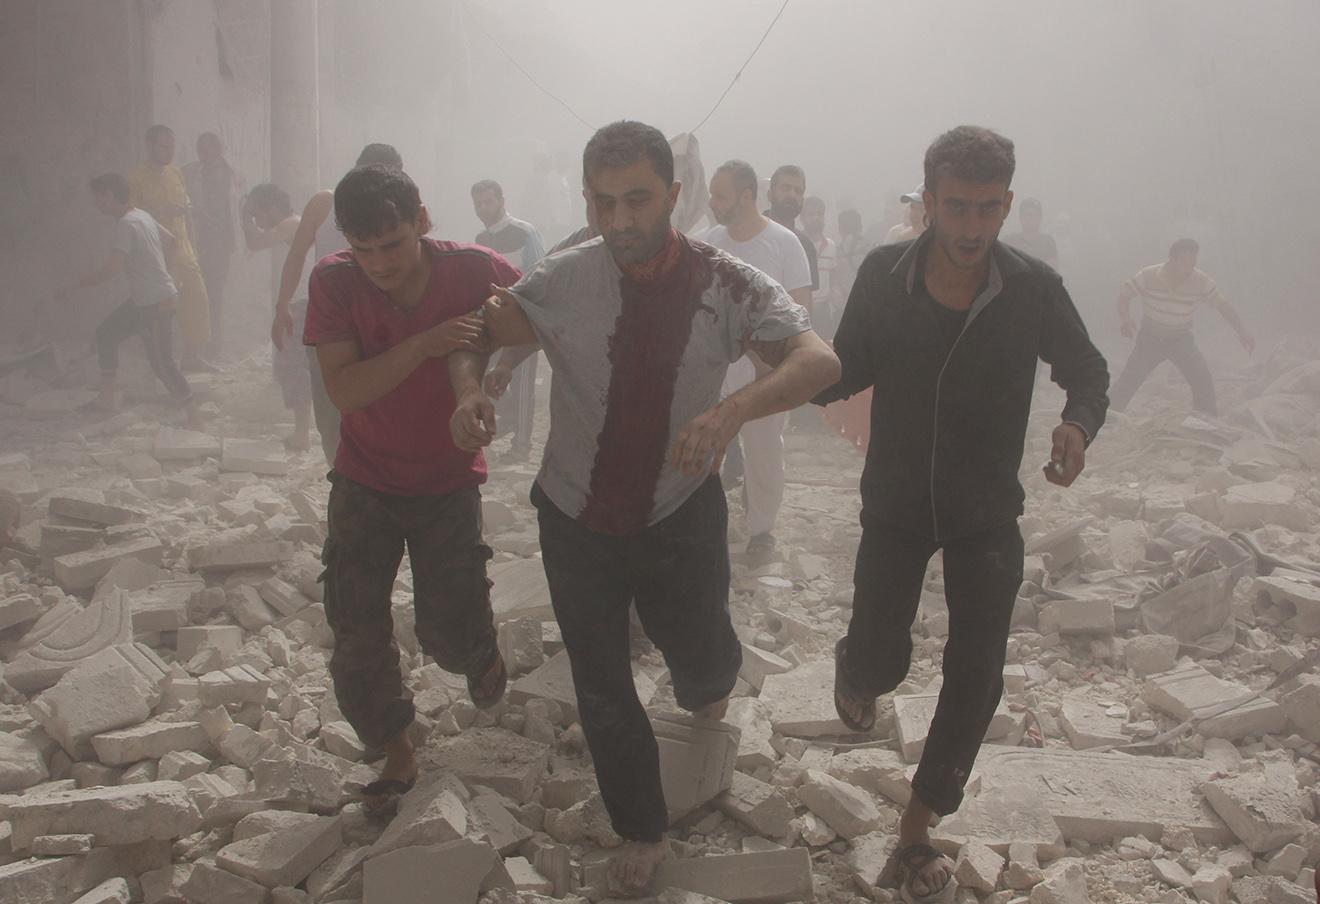 Последствия атаки сирийской армии в Алеппо. Фото: Ameer Al-Halbi / ТАСС